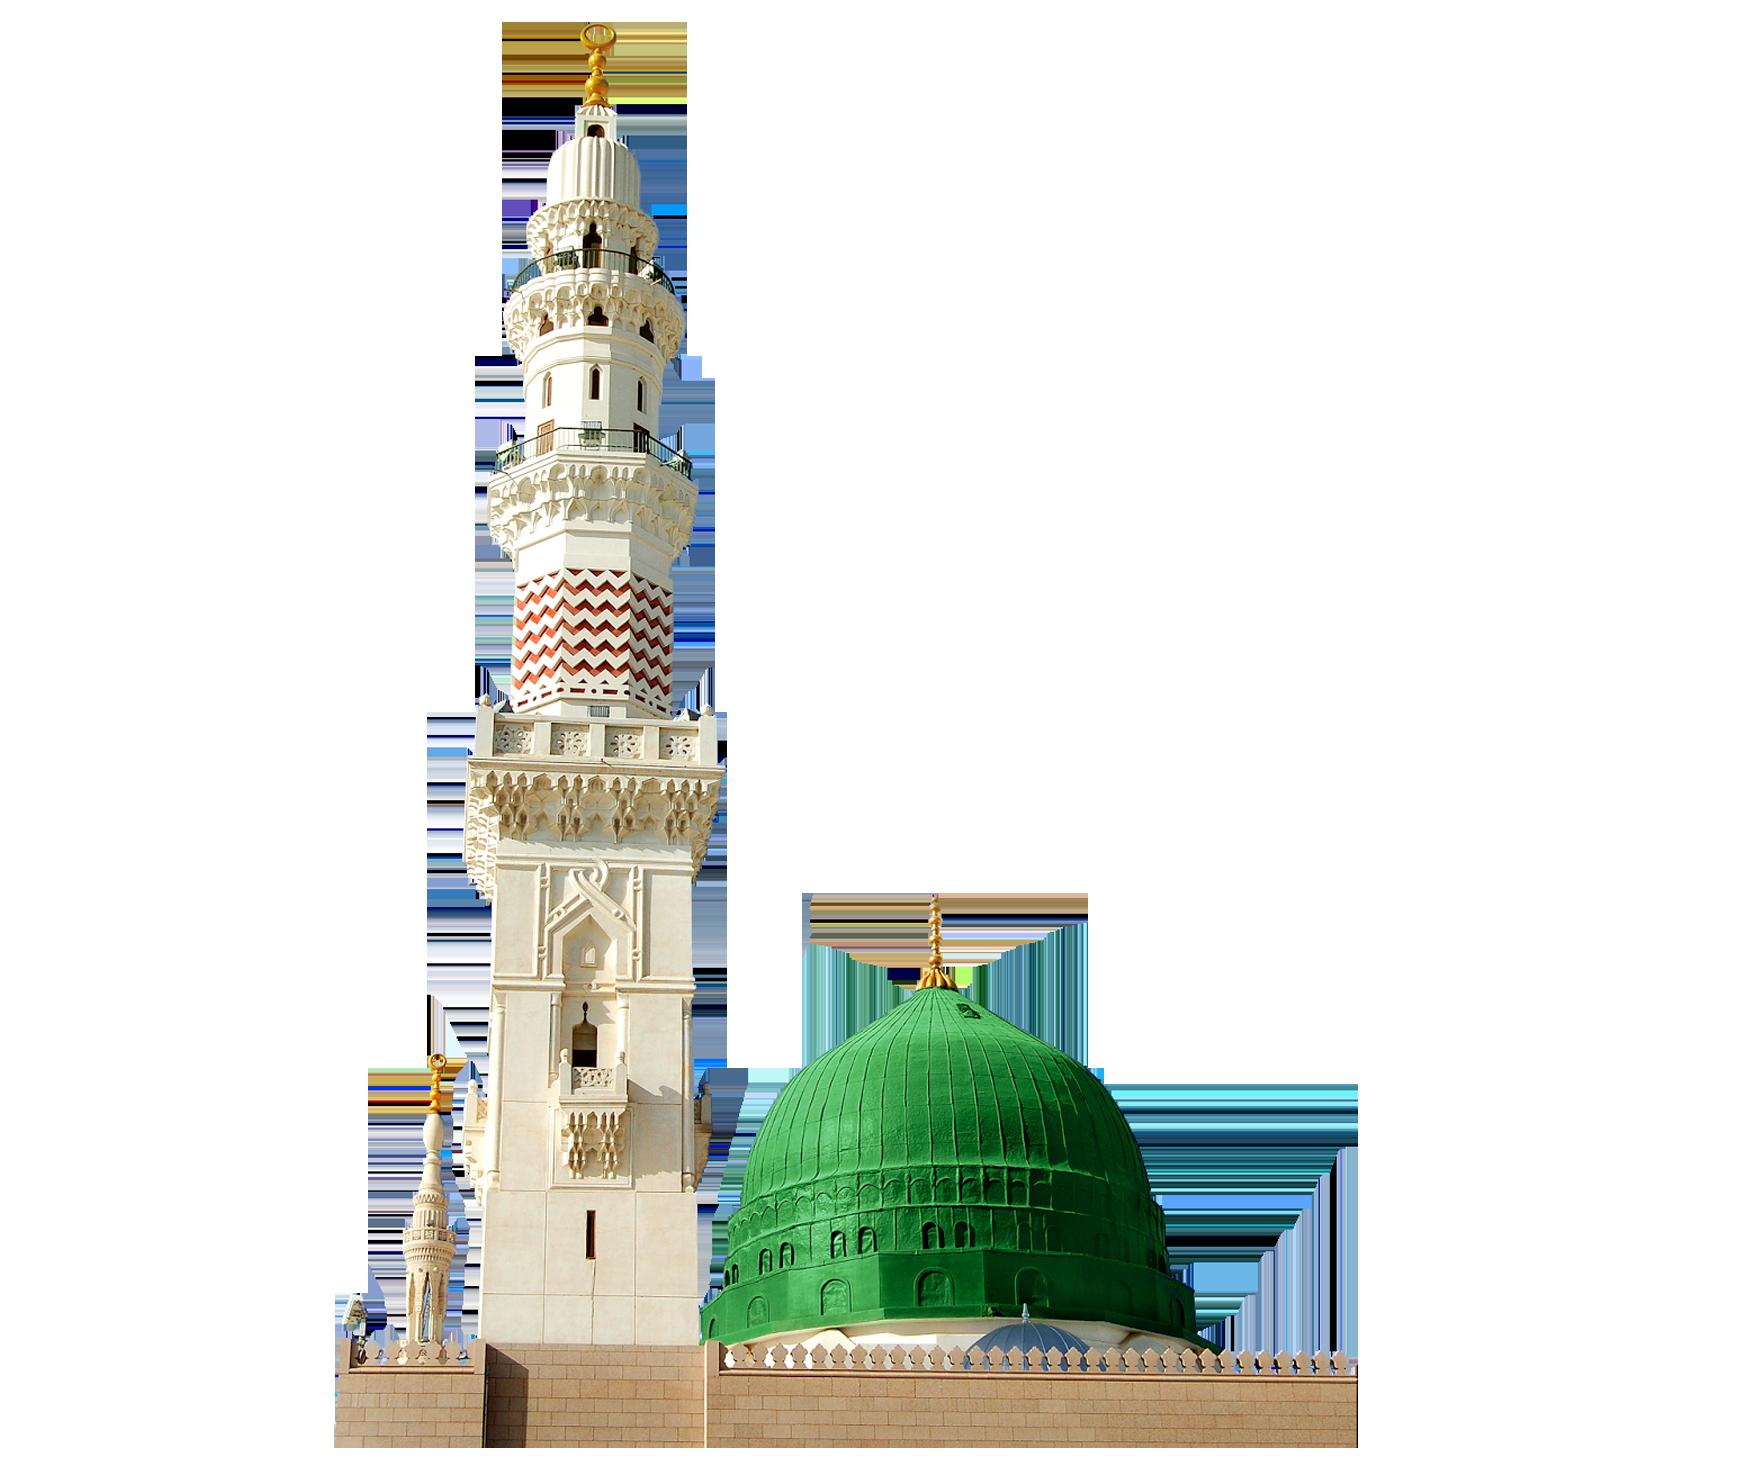 Pin by islamicpsd on islamicpsd.